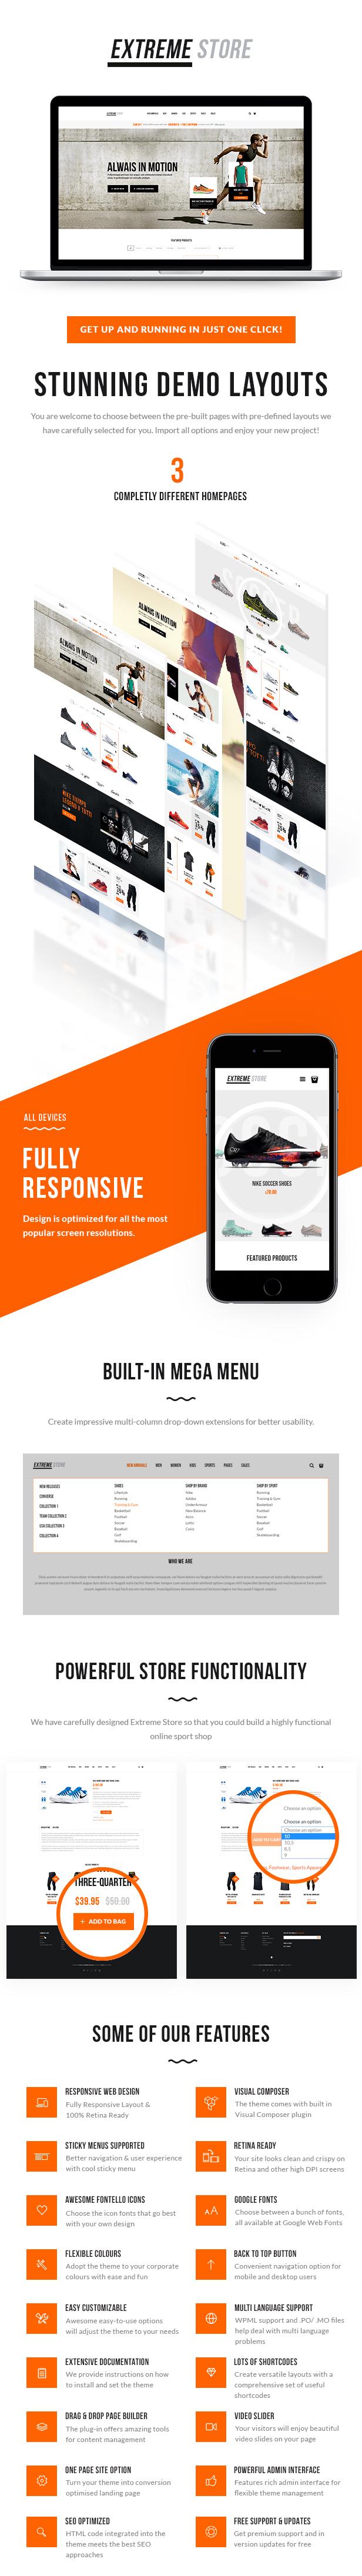 Sports Clothing & Equipment Store WordPress Theme Description